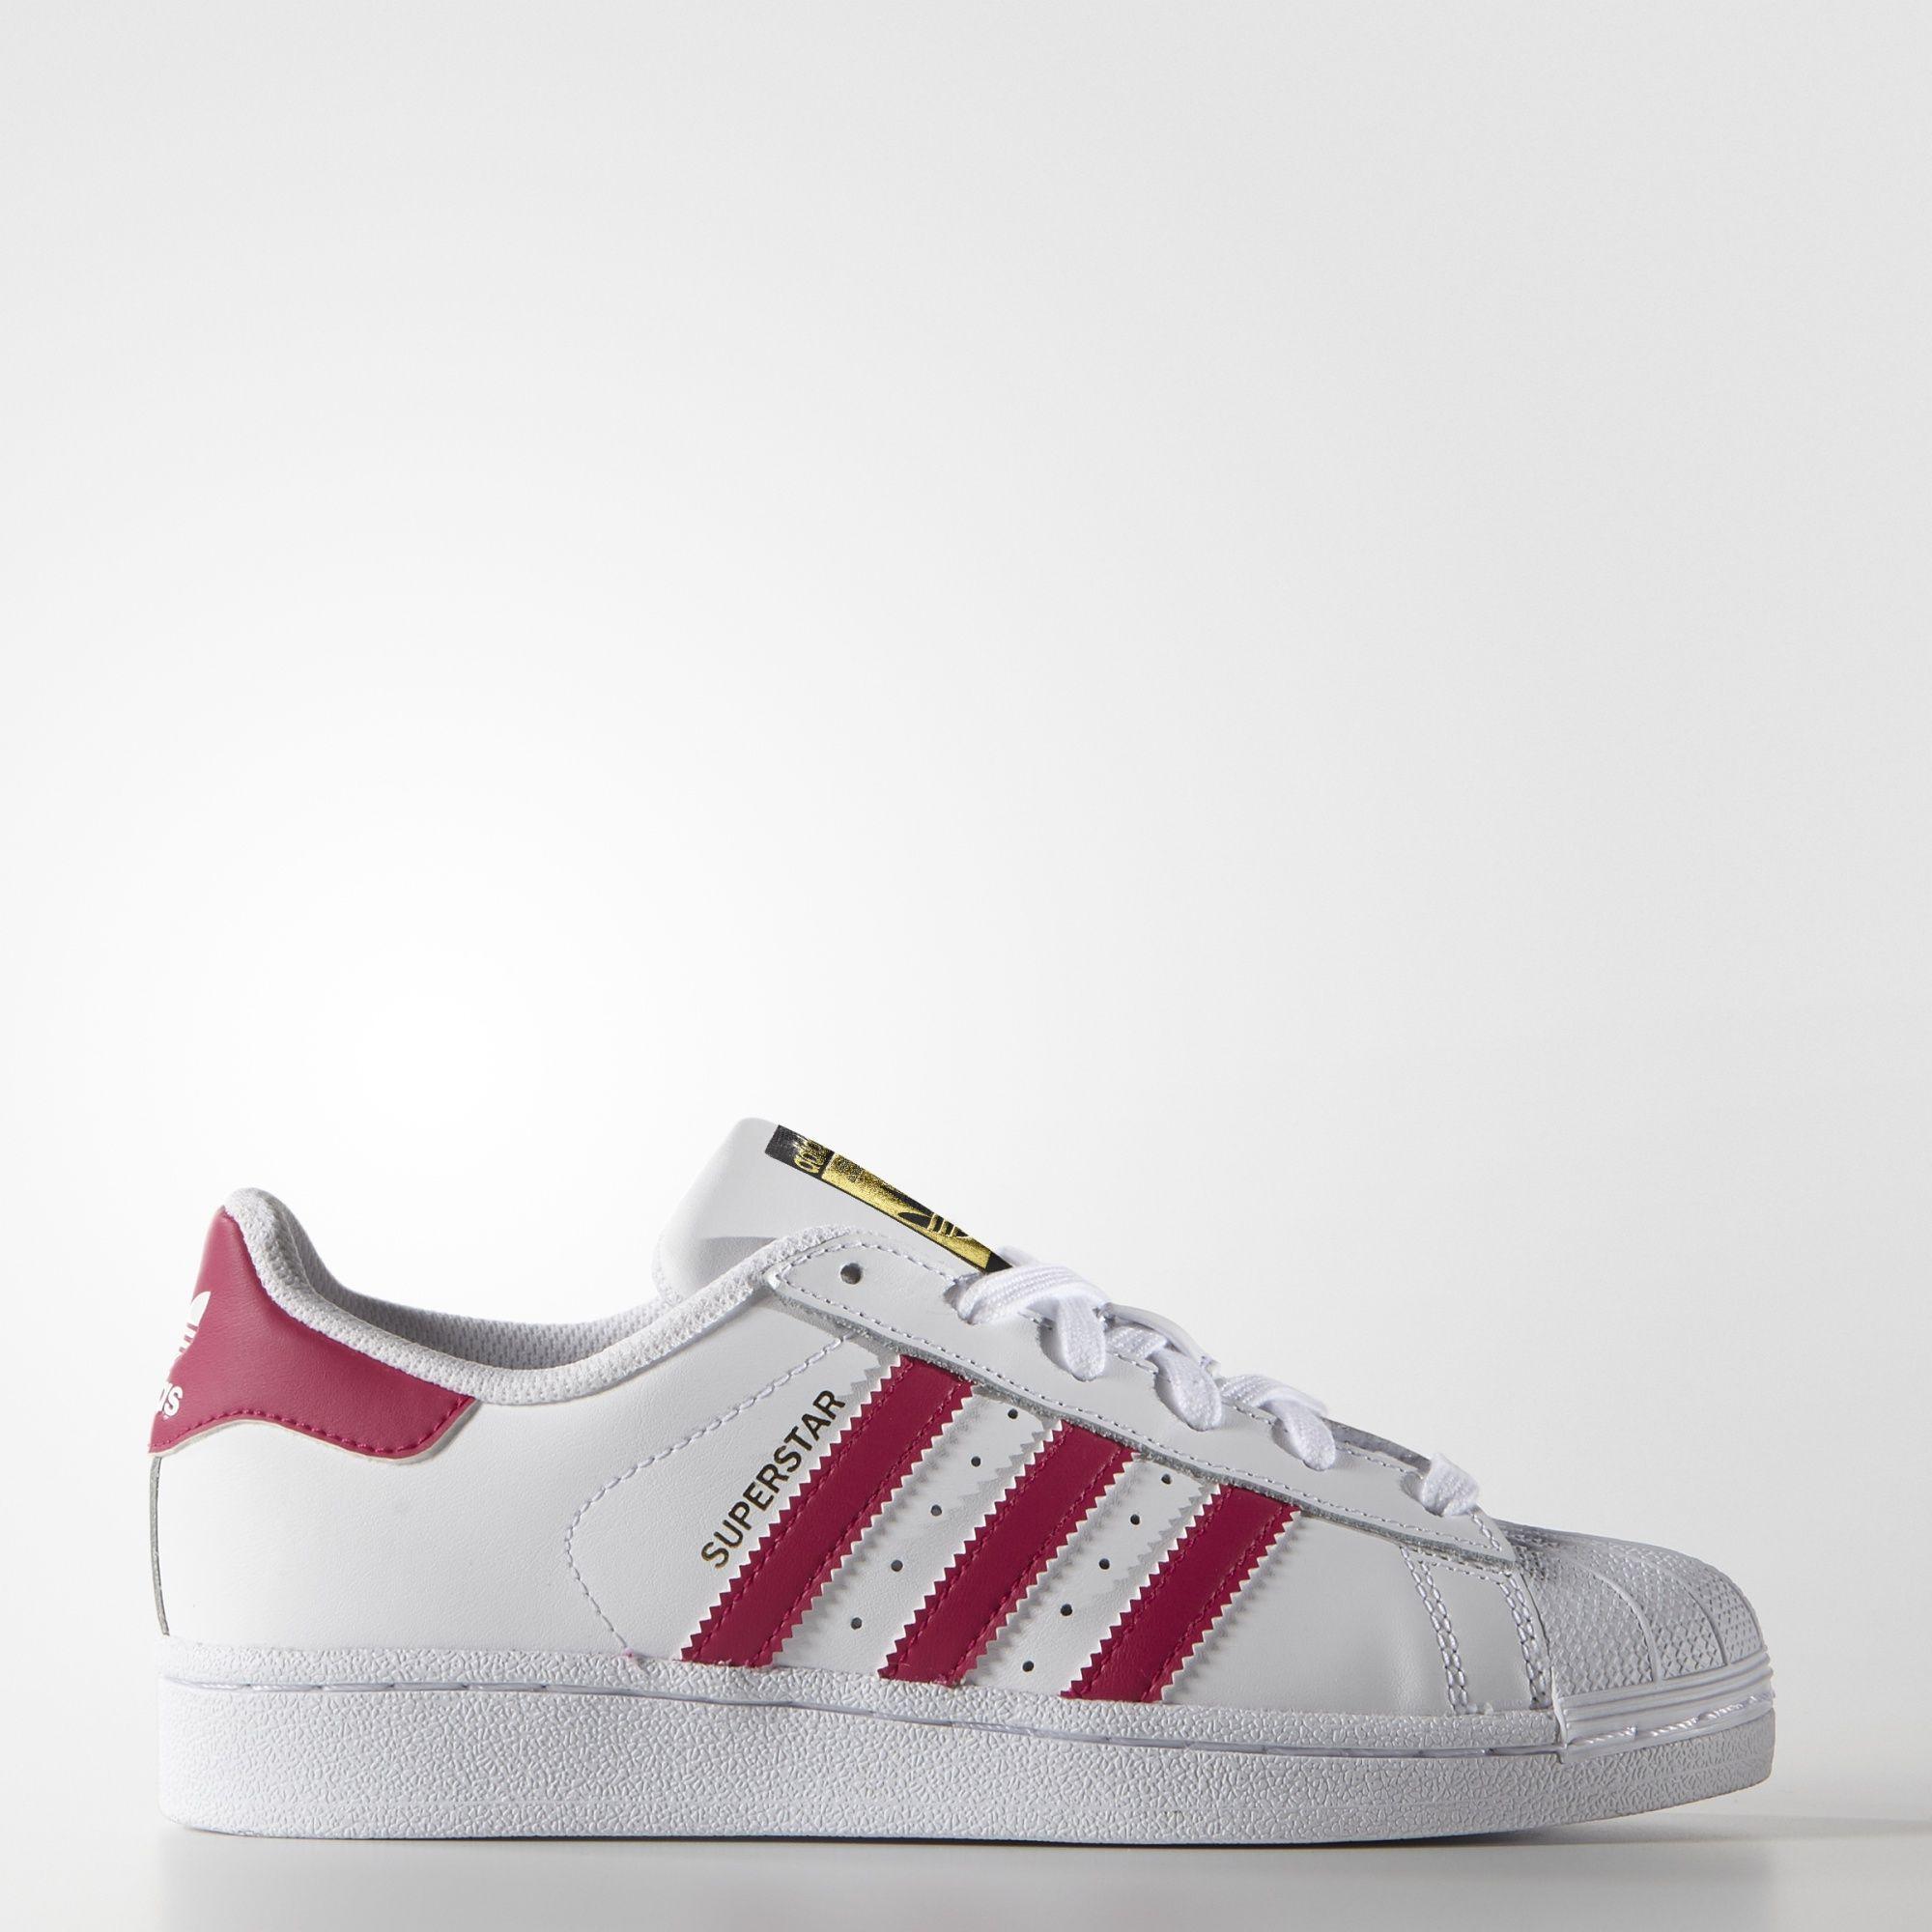 1a207eecfe Adidas Superstar - Sever Center Ruházati Áruház